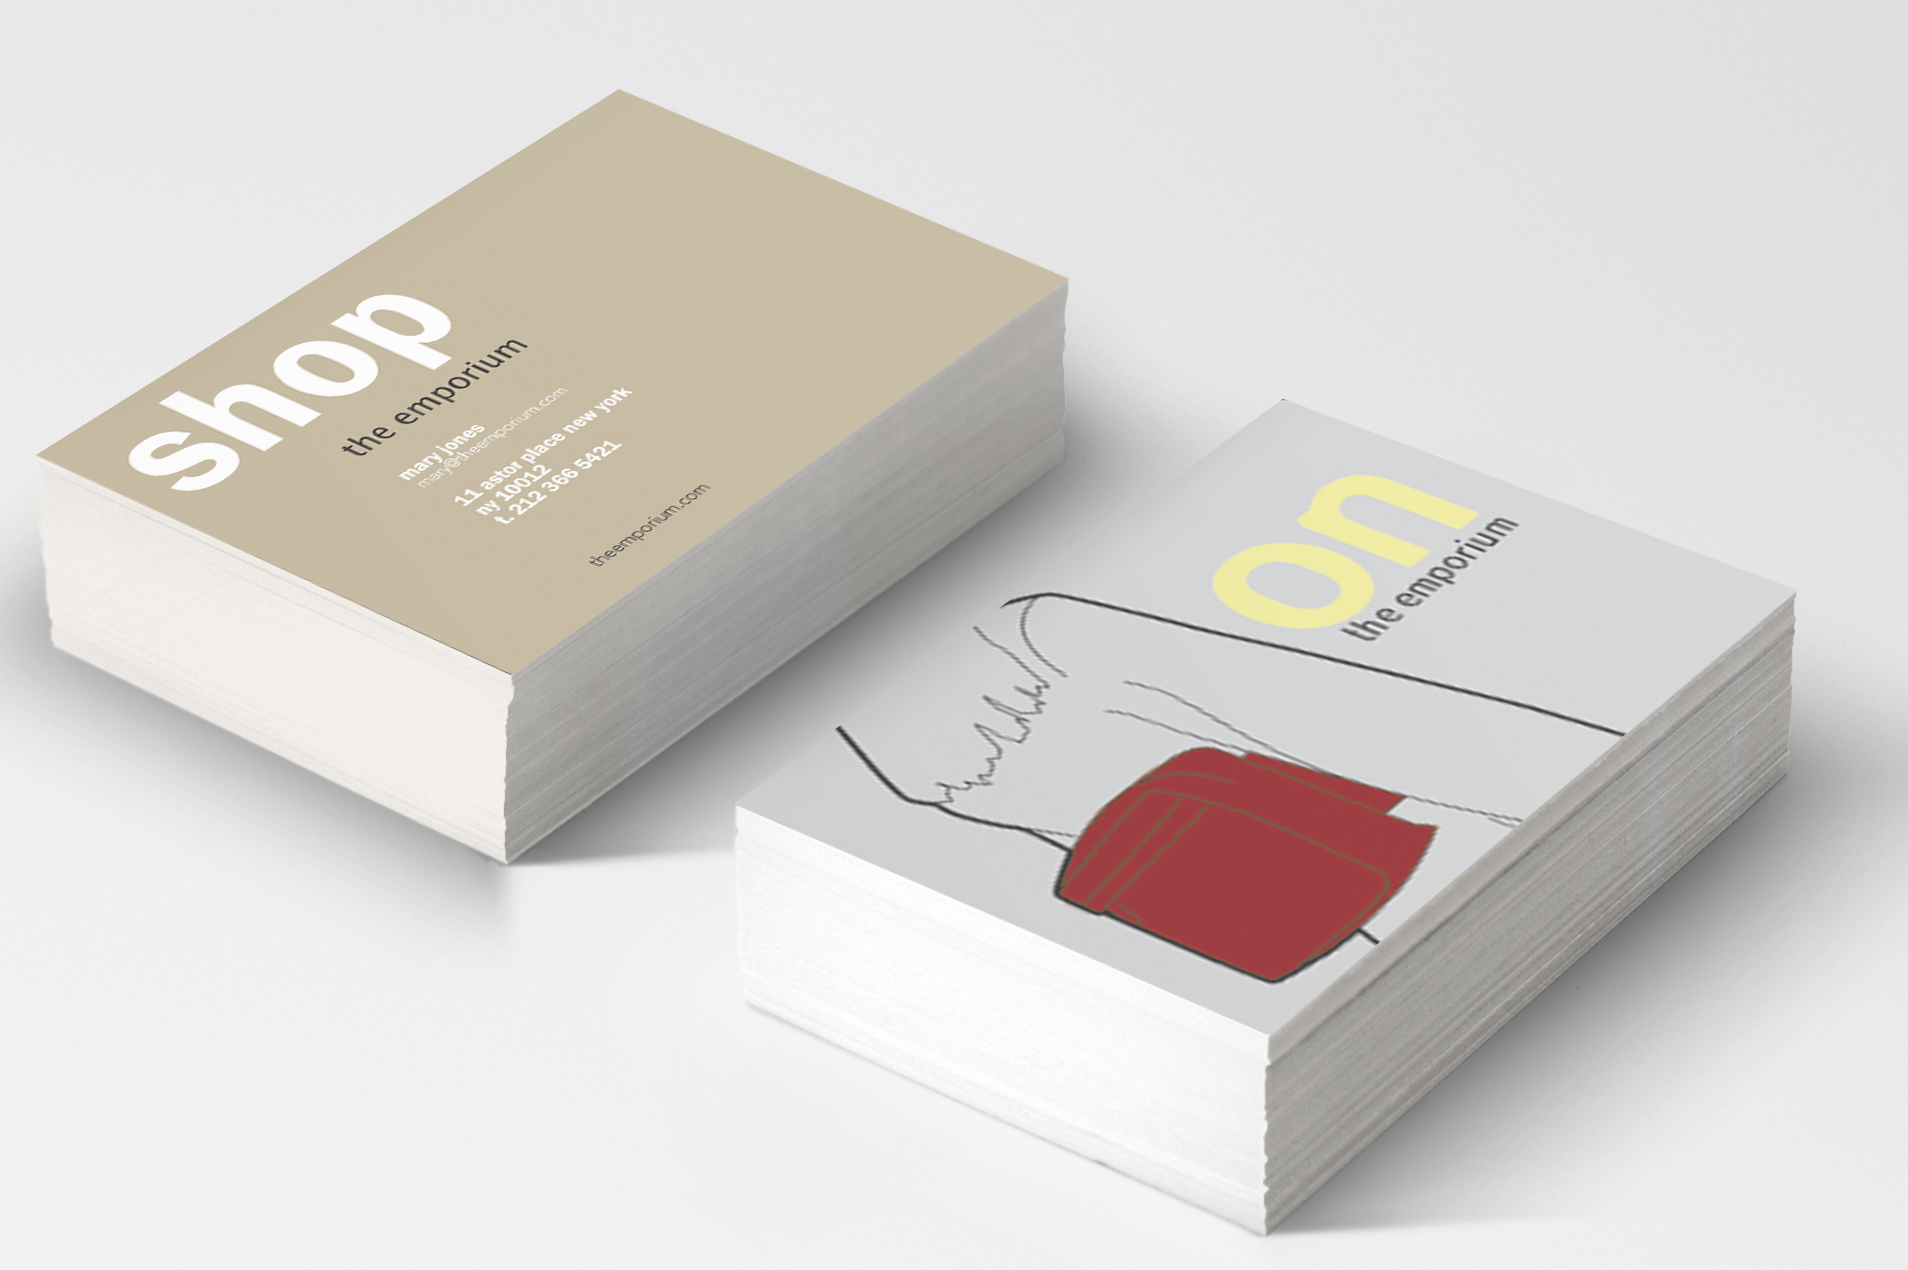 Emporium Business cards 3.jpg